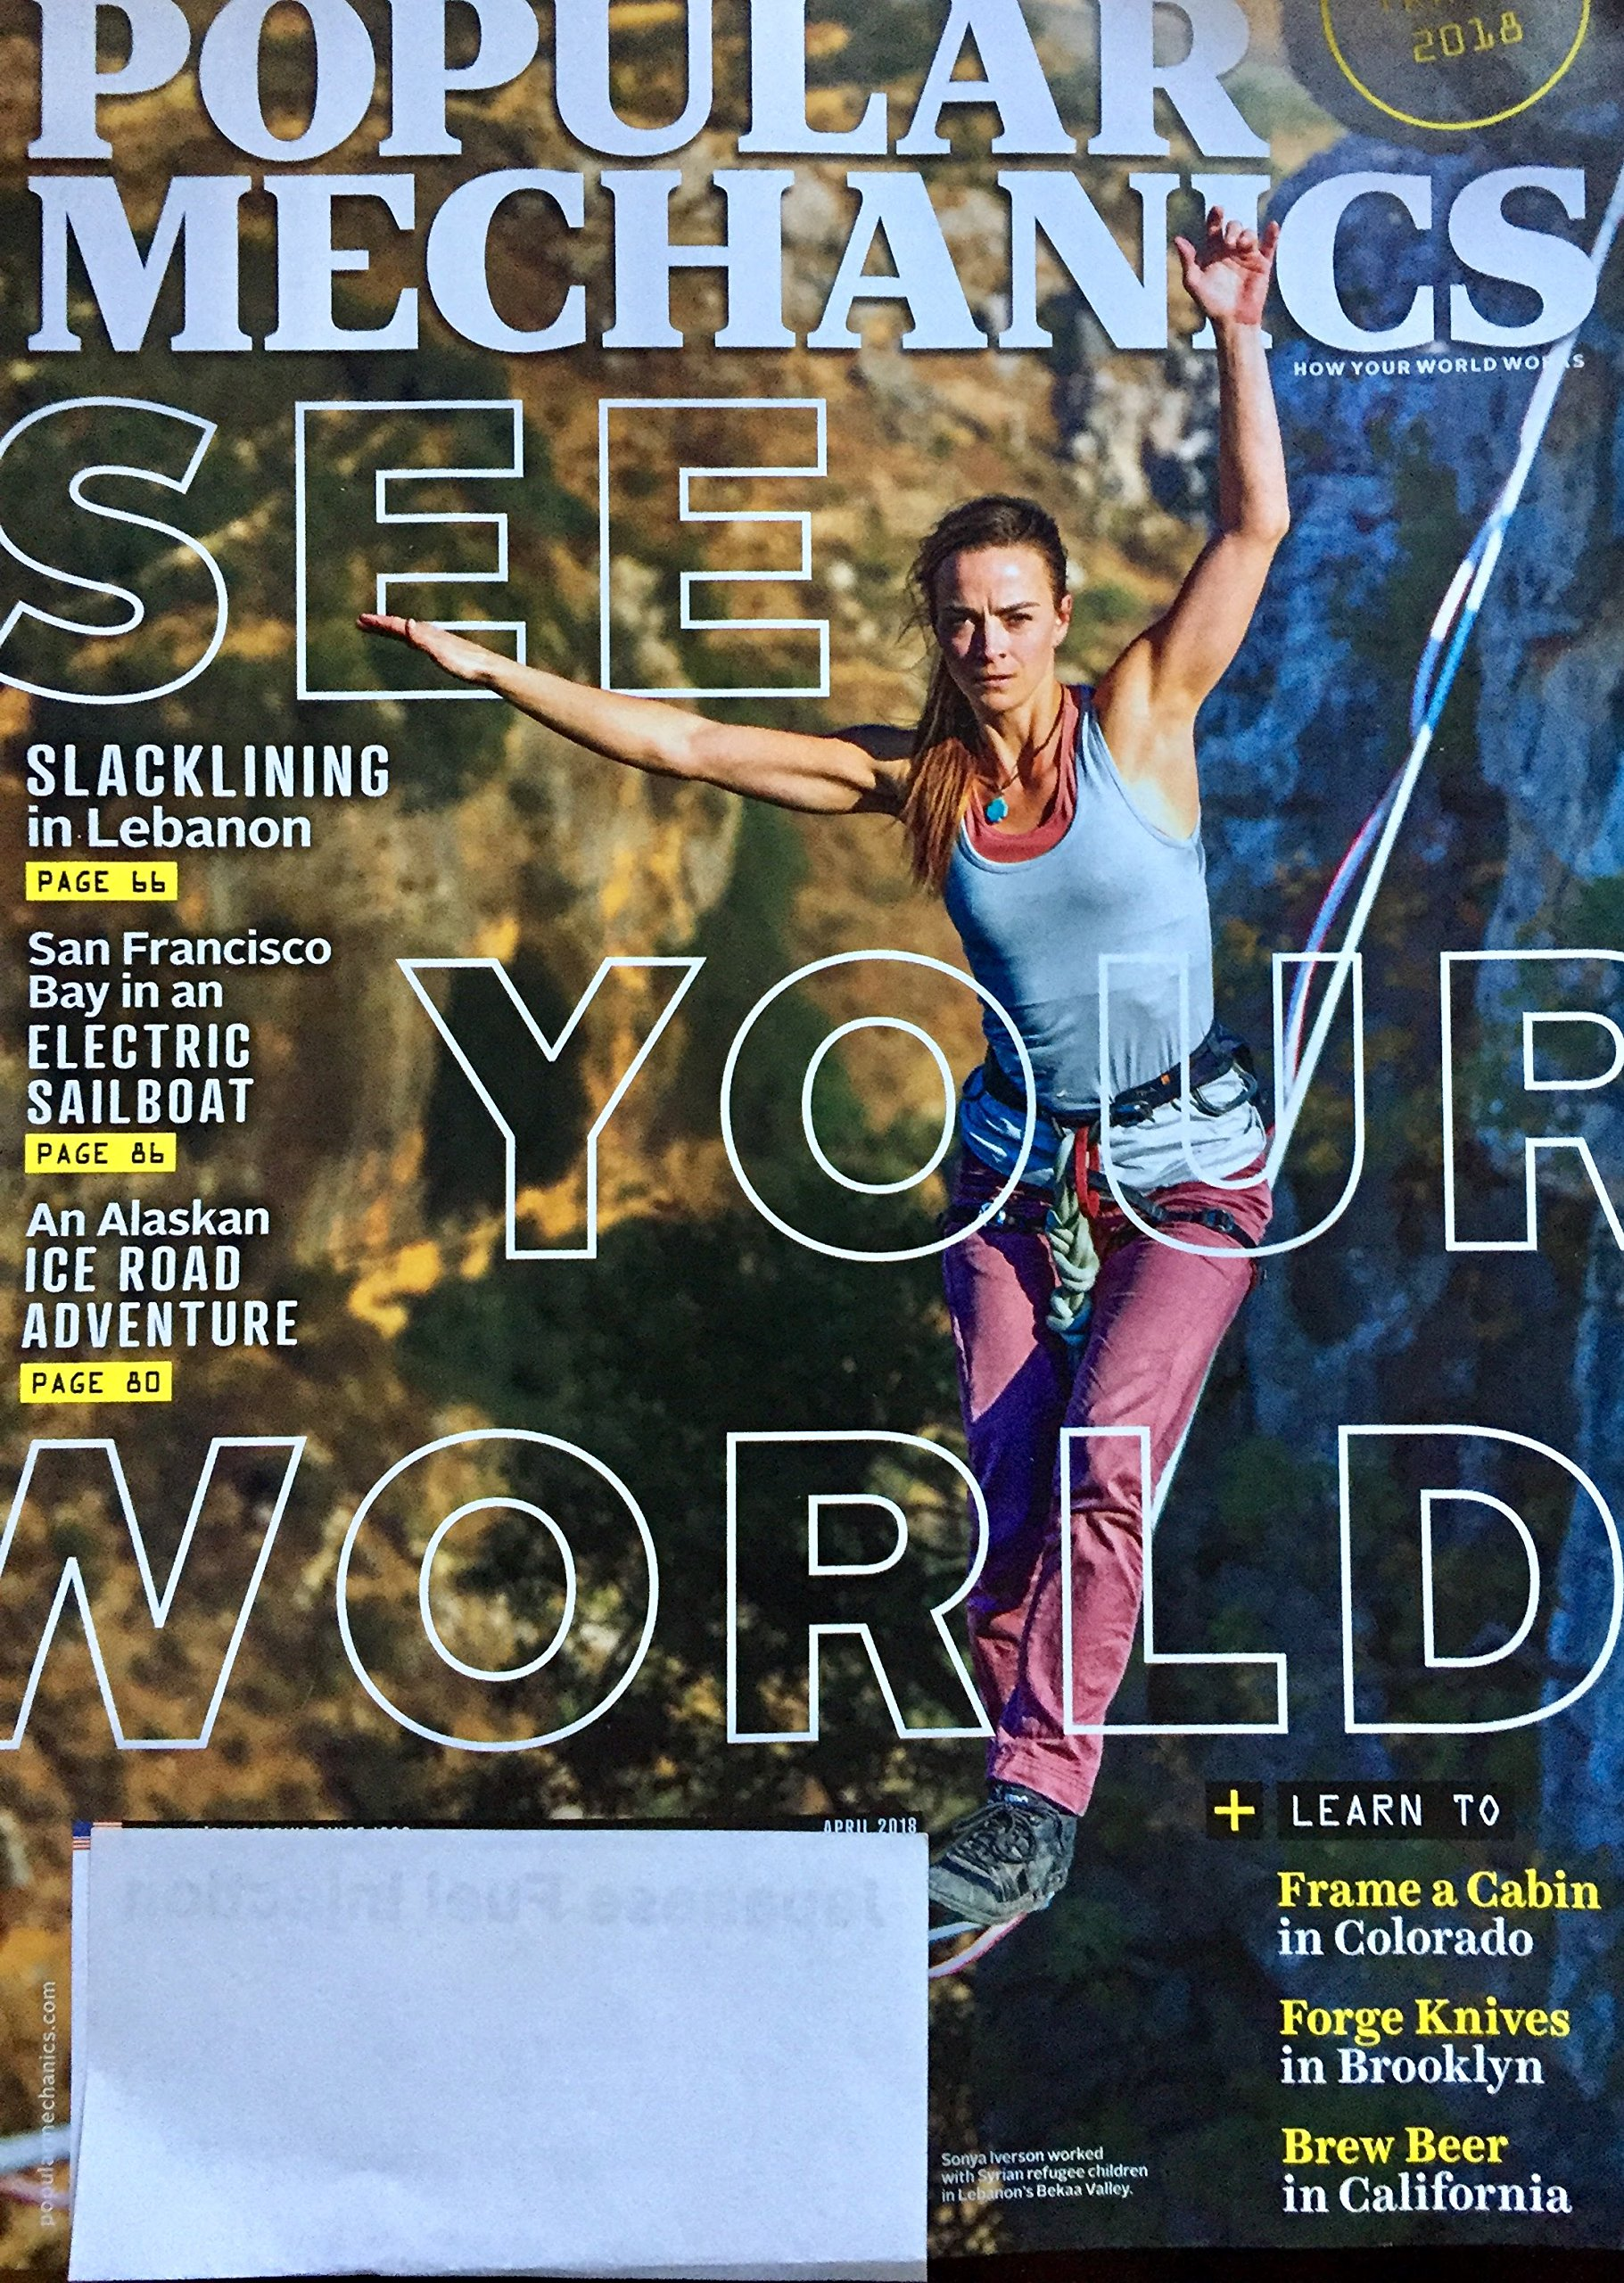 Popular Mechanics April 2018 See Your World Amazon Com Books